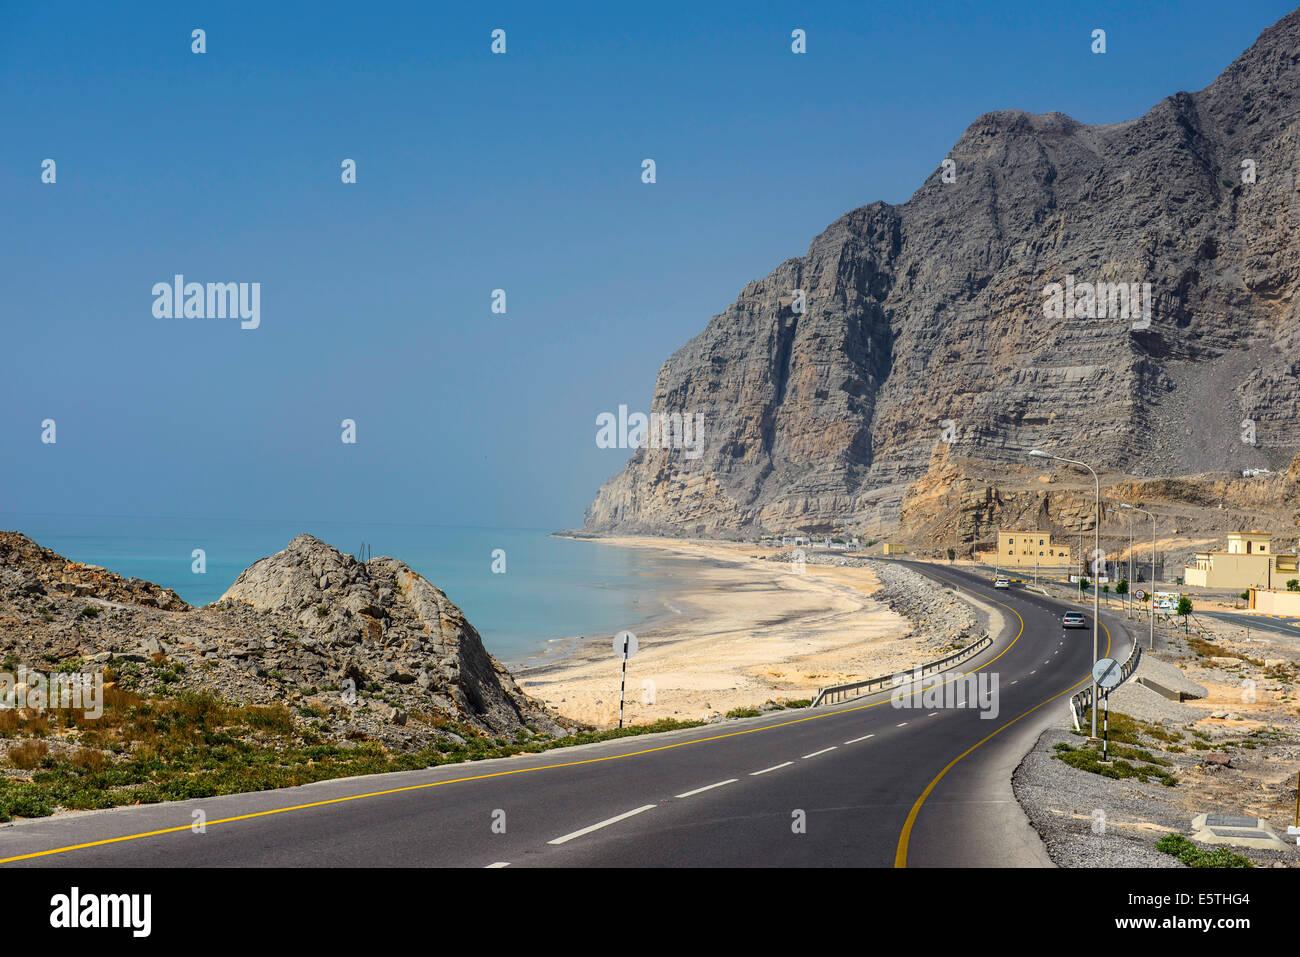 Khasab coastal road, Abu Dhabi, Oman, Middle East Photo Stock